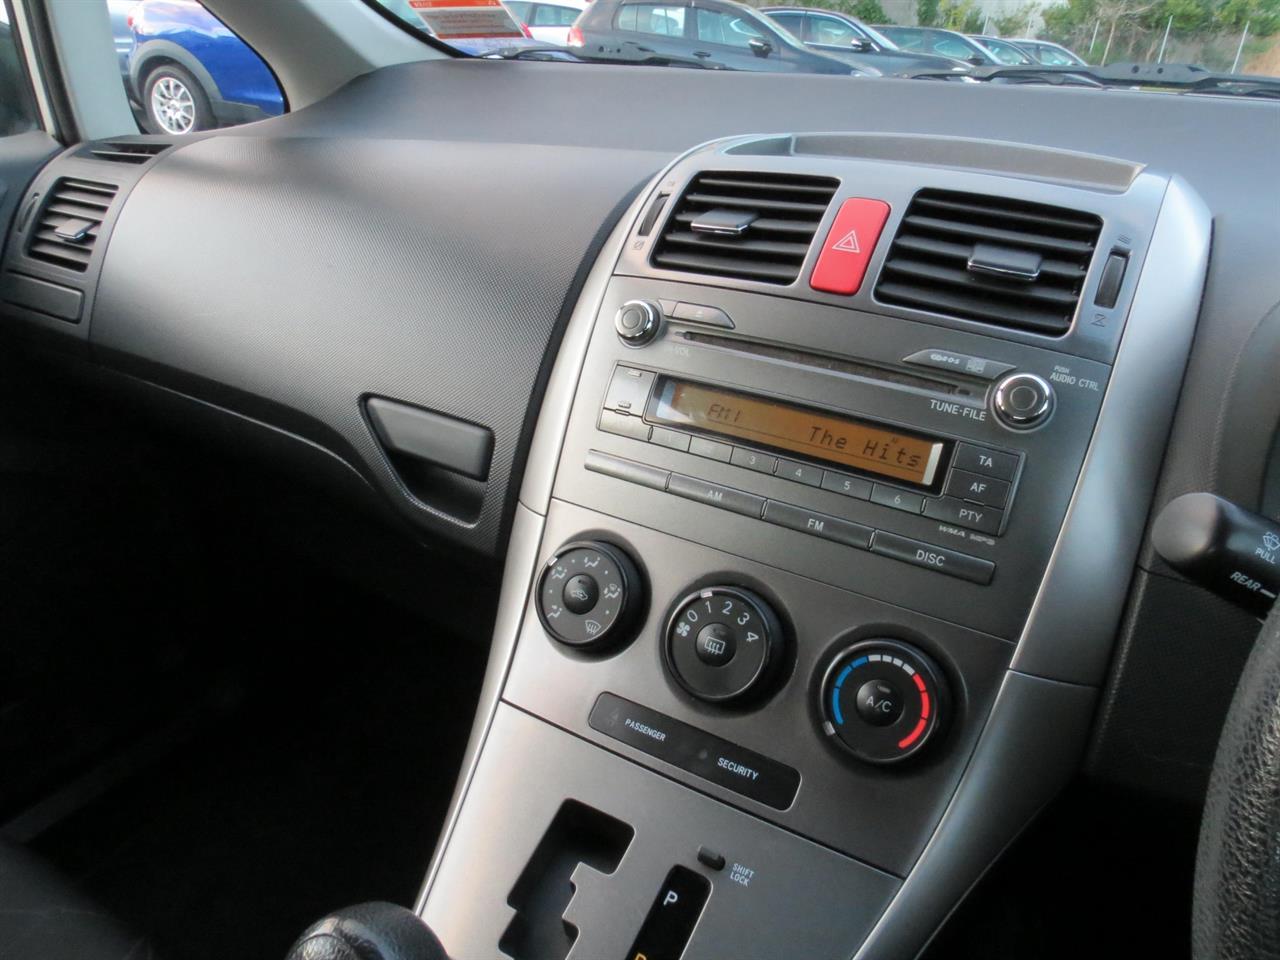 2008 Toyota Corolla only $26 weekly